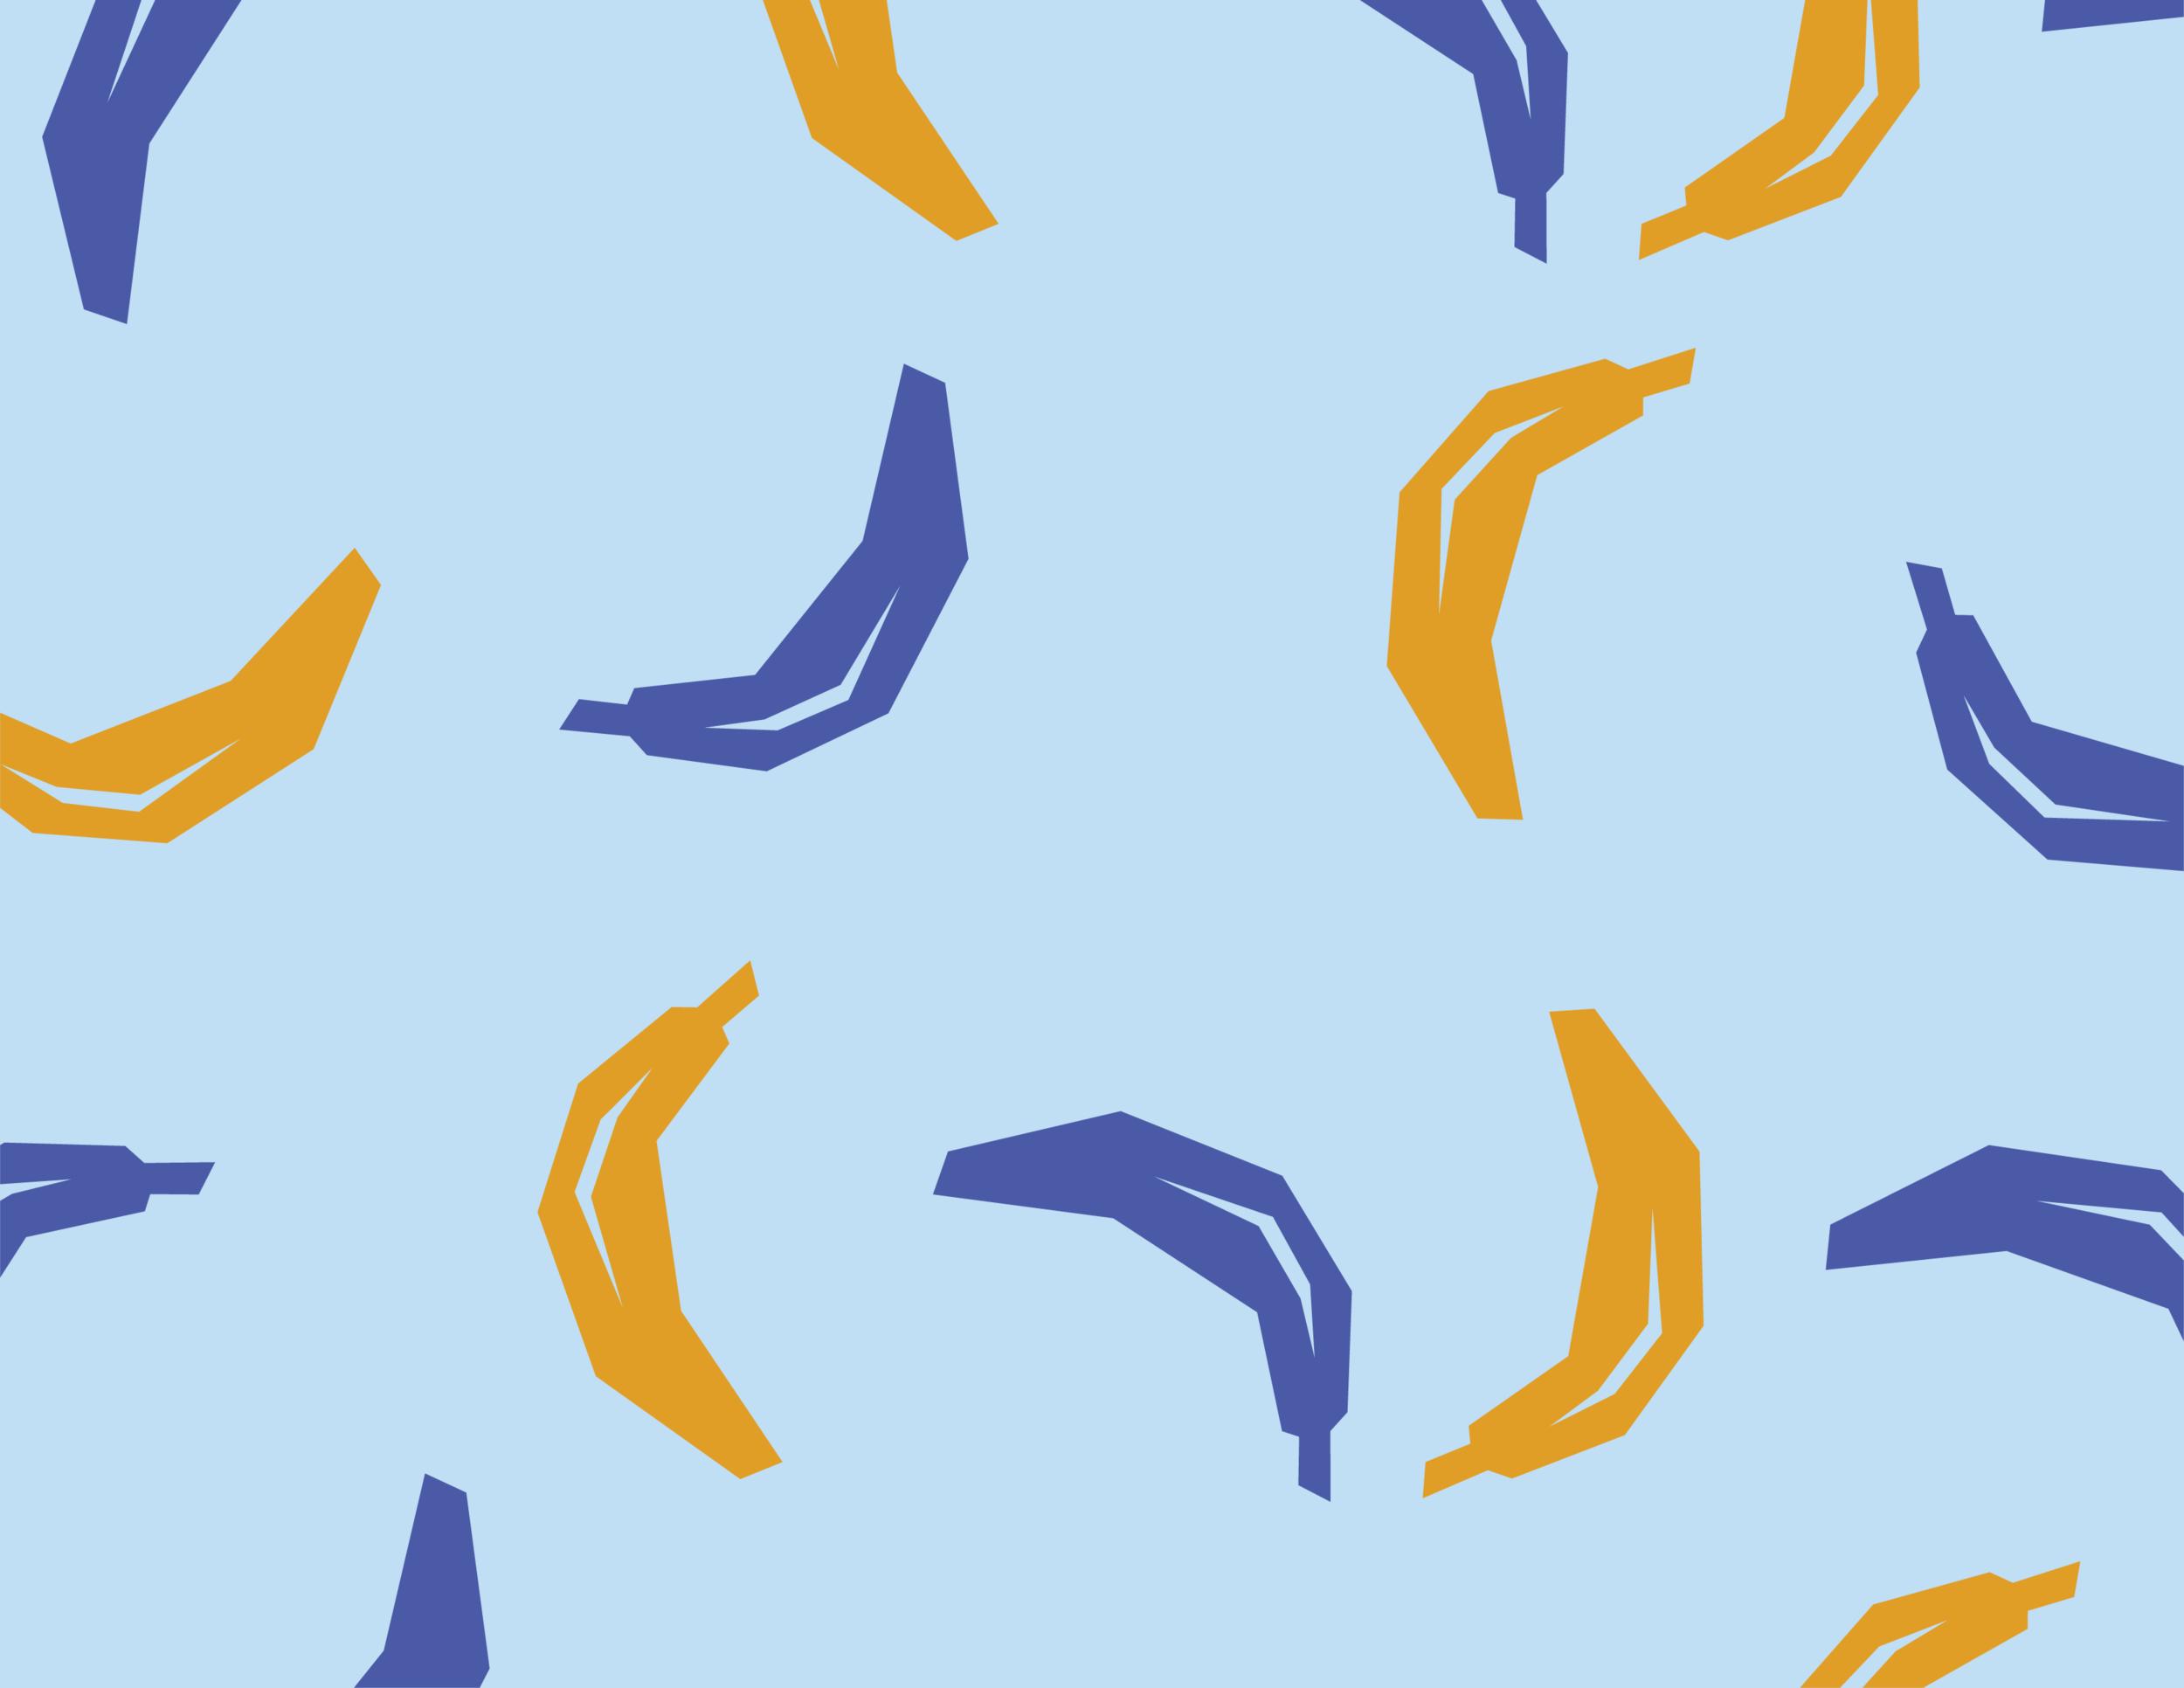 ICJ_Patterns_Bananas_RGB.png